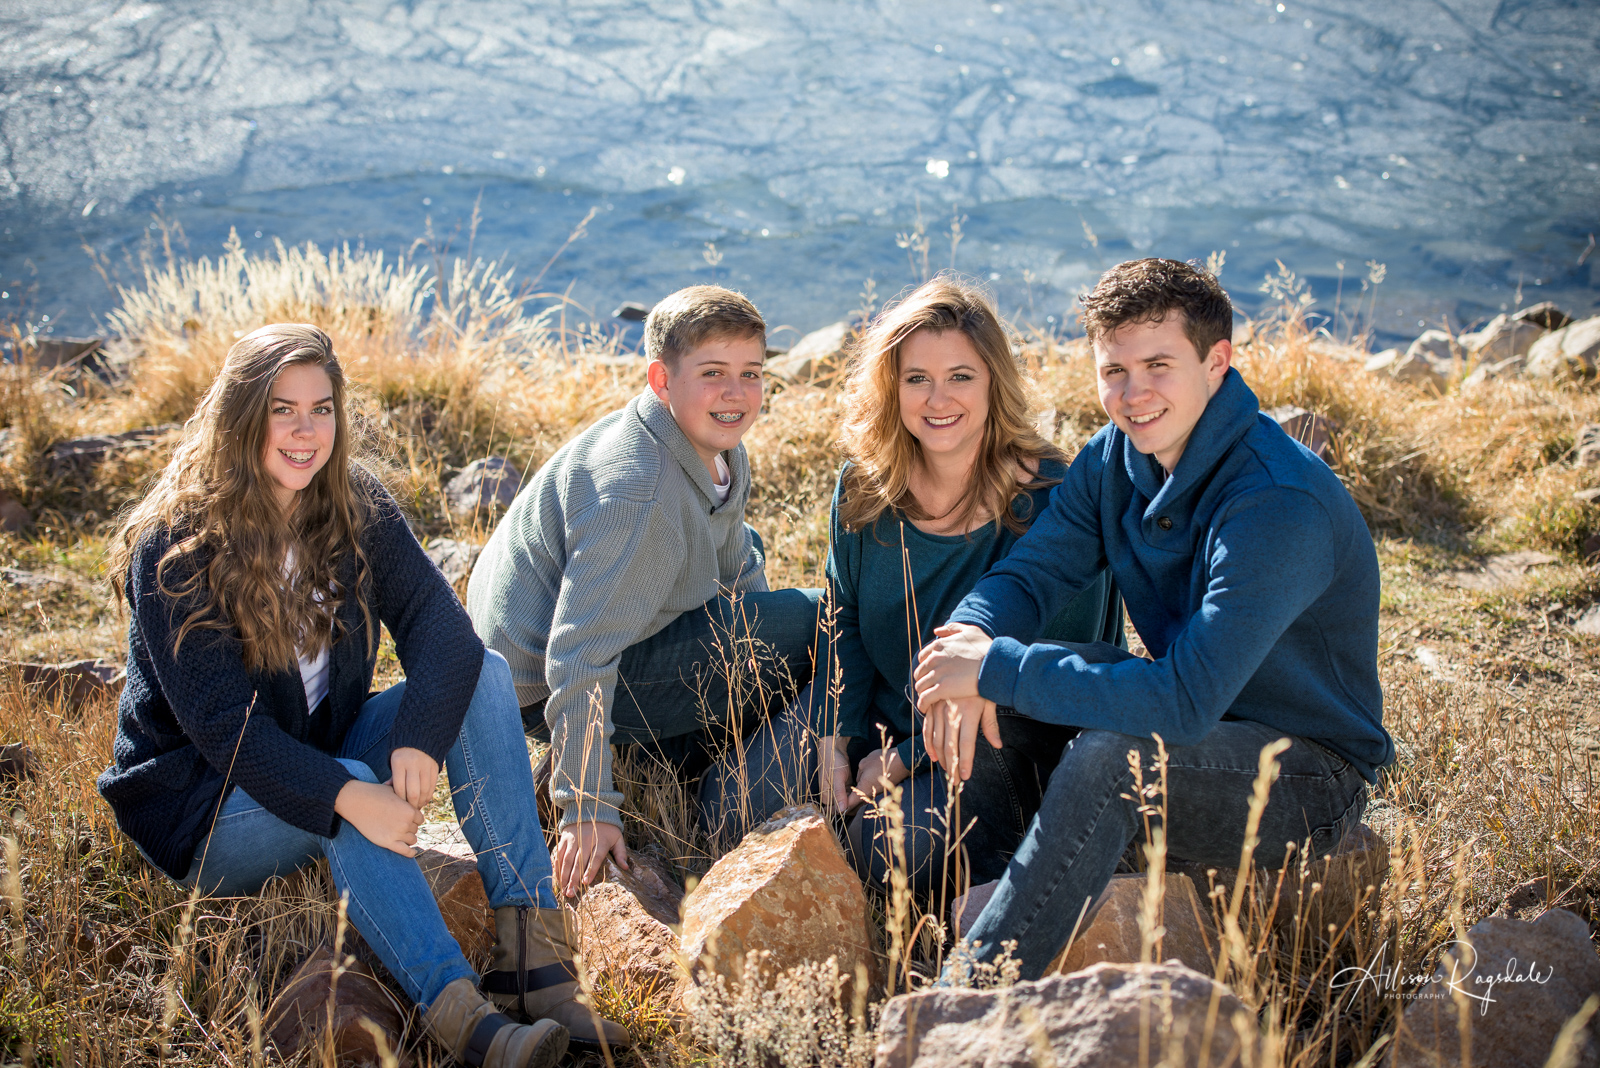 Family outdoor portraits in Durango Colorado